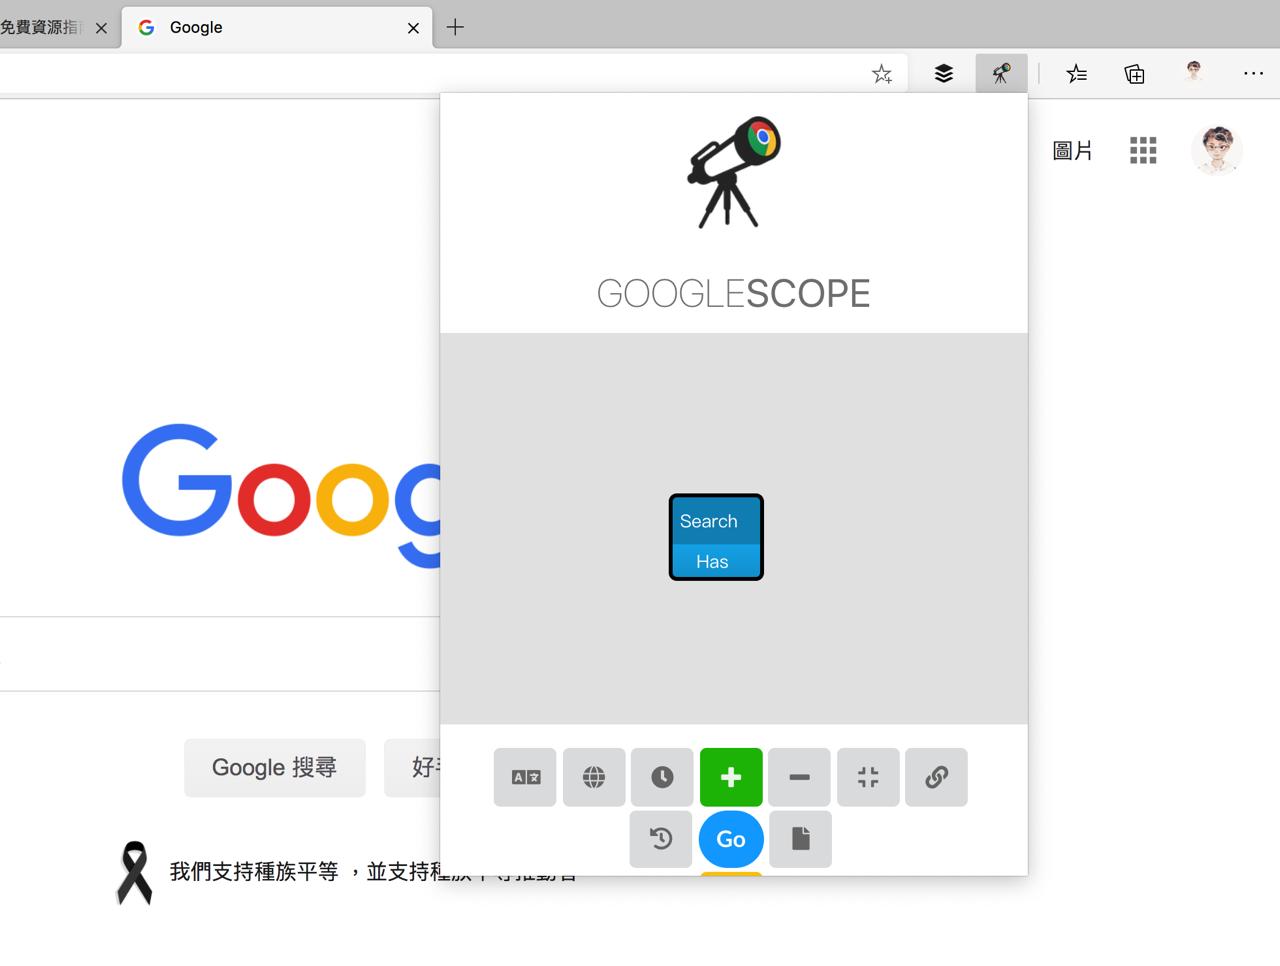 Googlescope